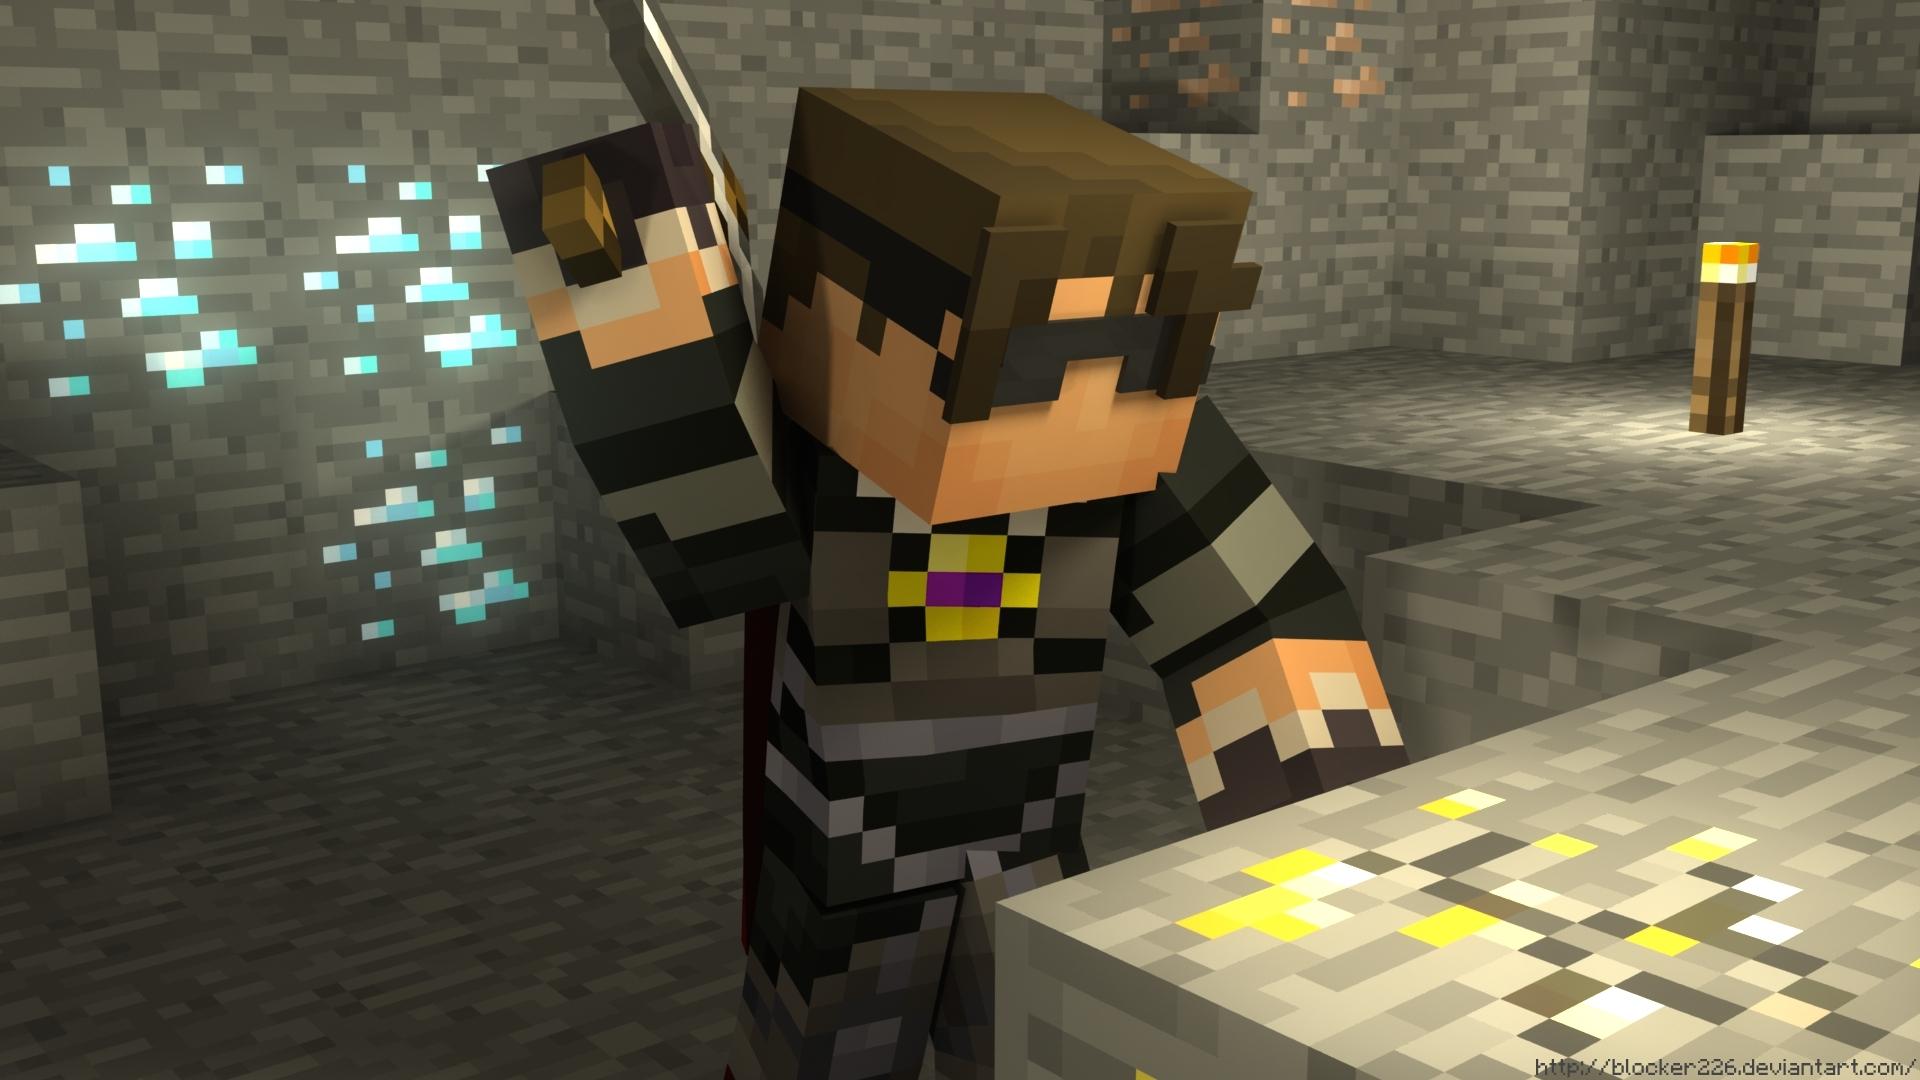 Skydoesminecraft Fan Art Tumblr Minecraft Budder Over Diamonds By Blocker Dg